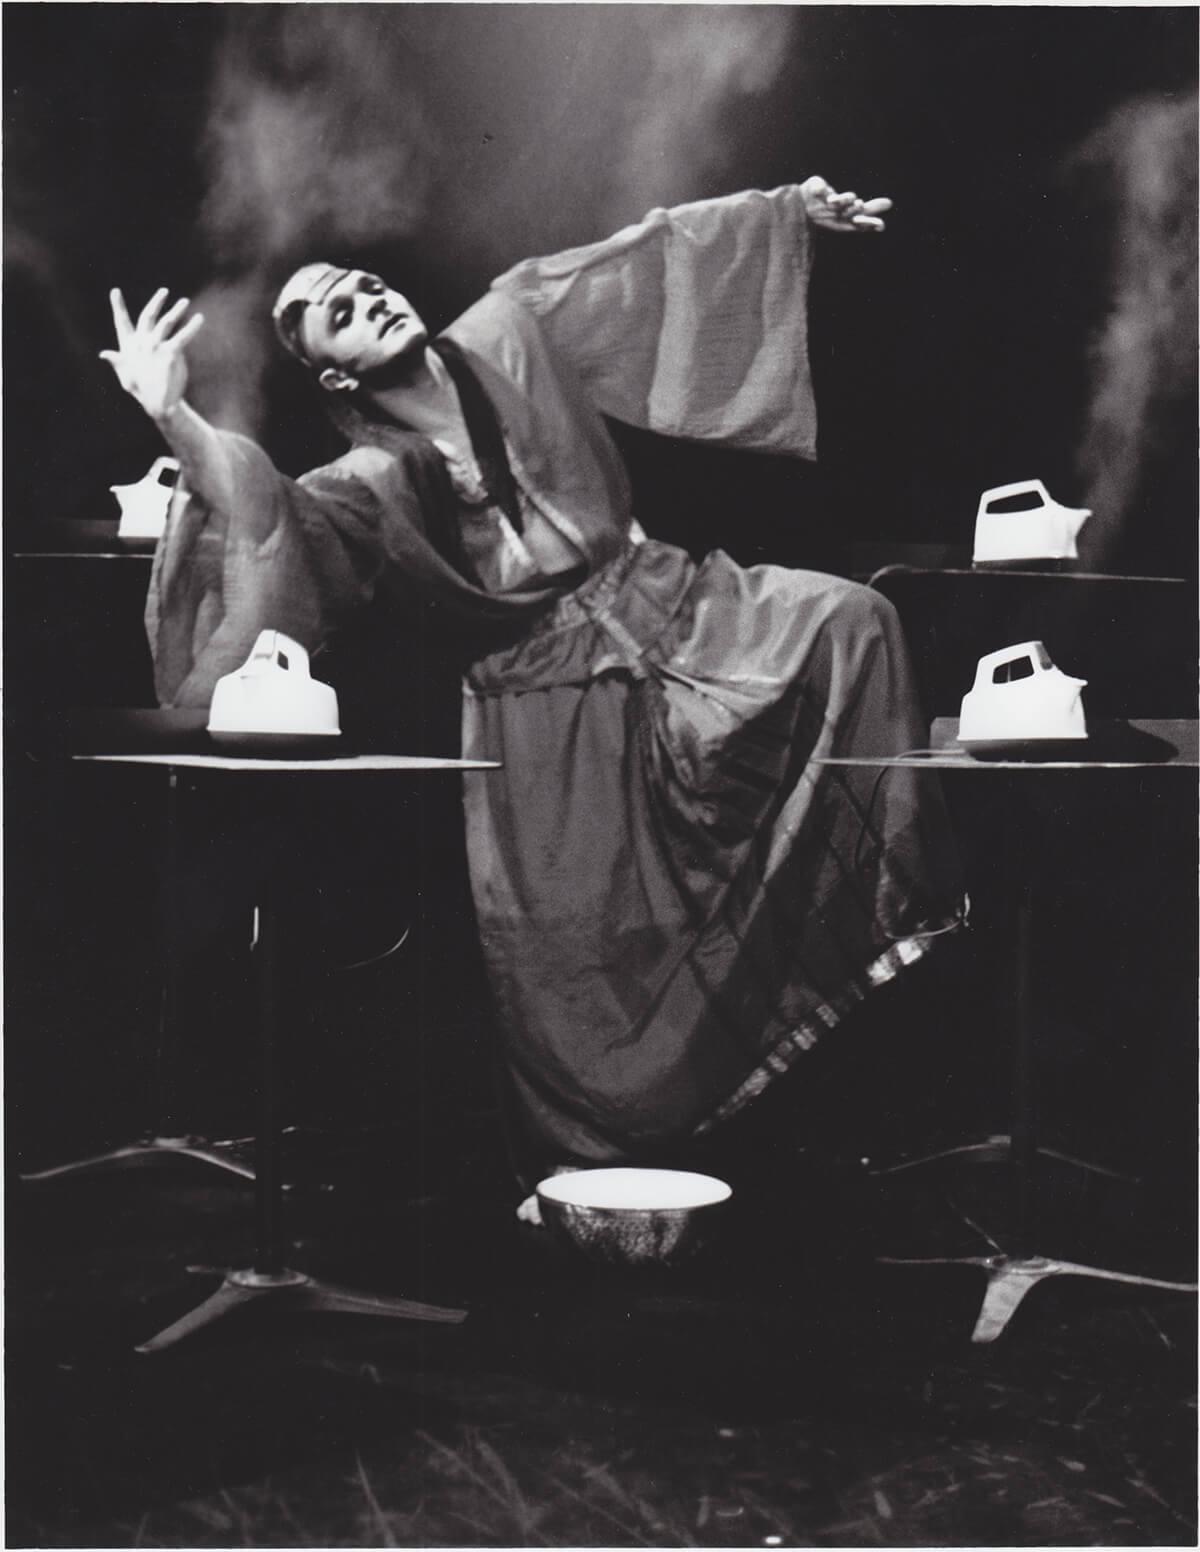 Sinha Danse 1992 Burning Skin - Roger Sinha Image credit: Stephen Hues